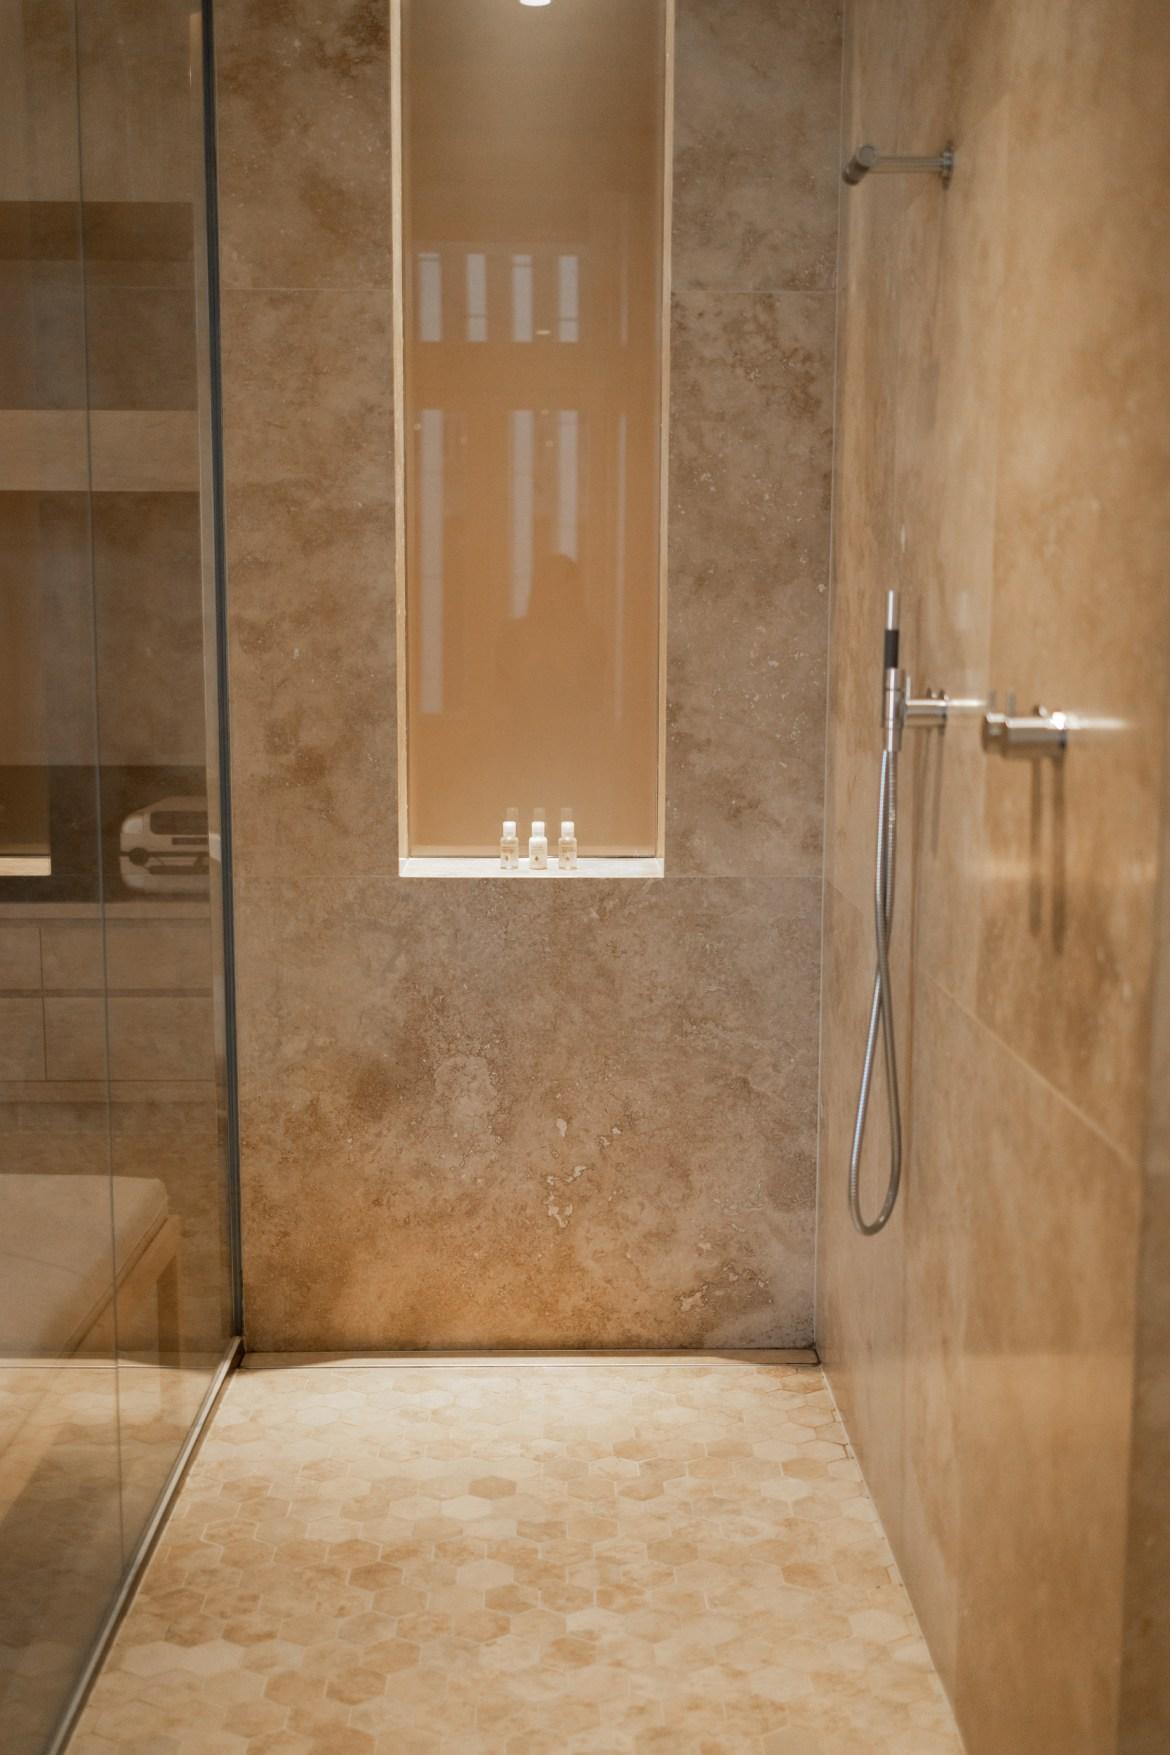 Travertine bathroom shower at Como the Treasury hotel in Perth